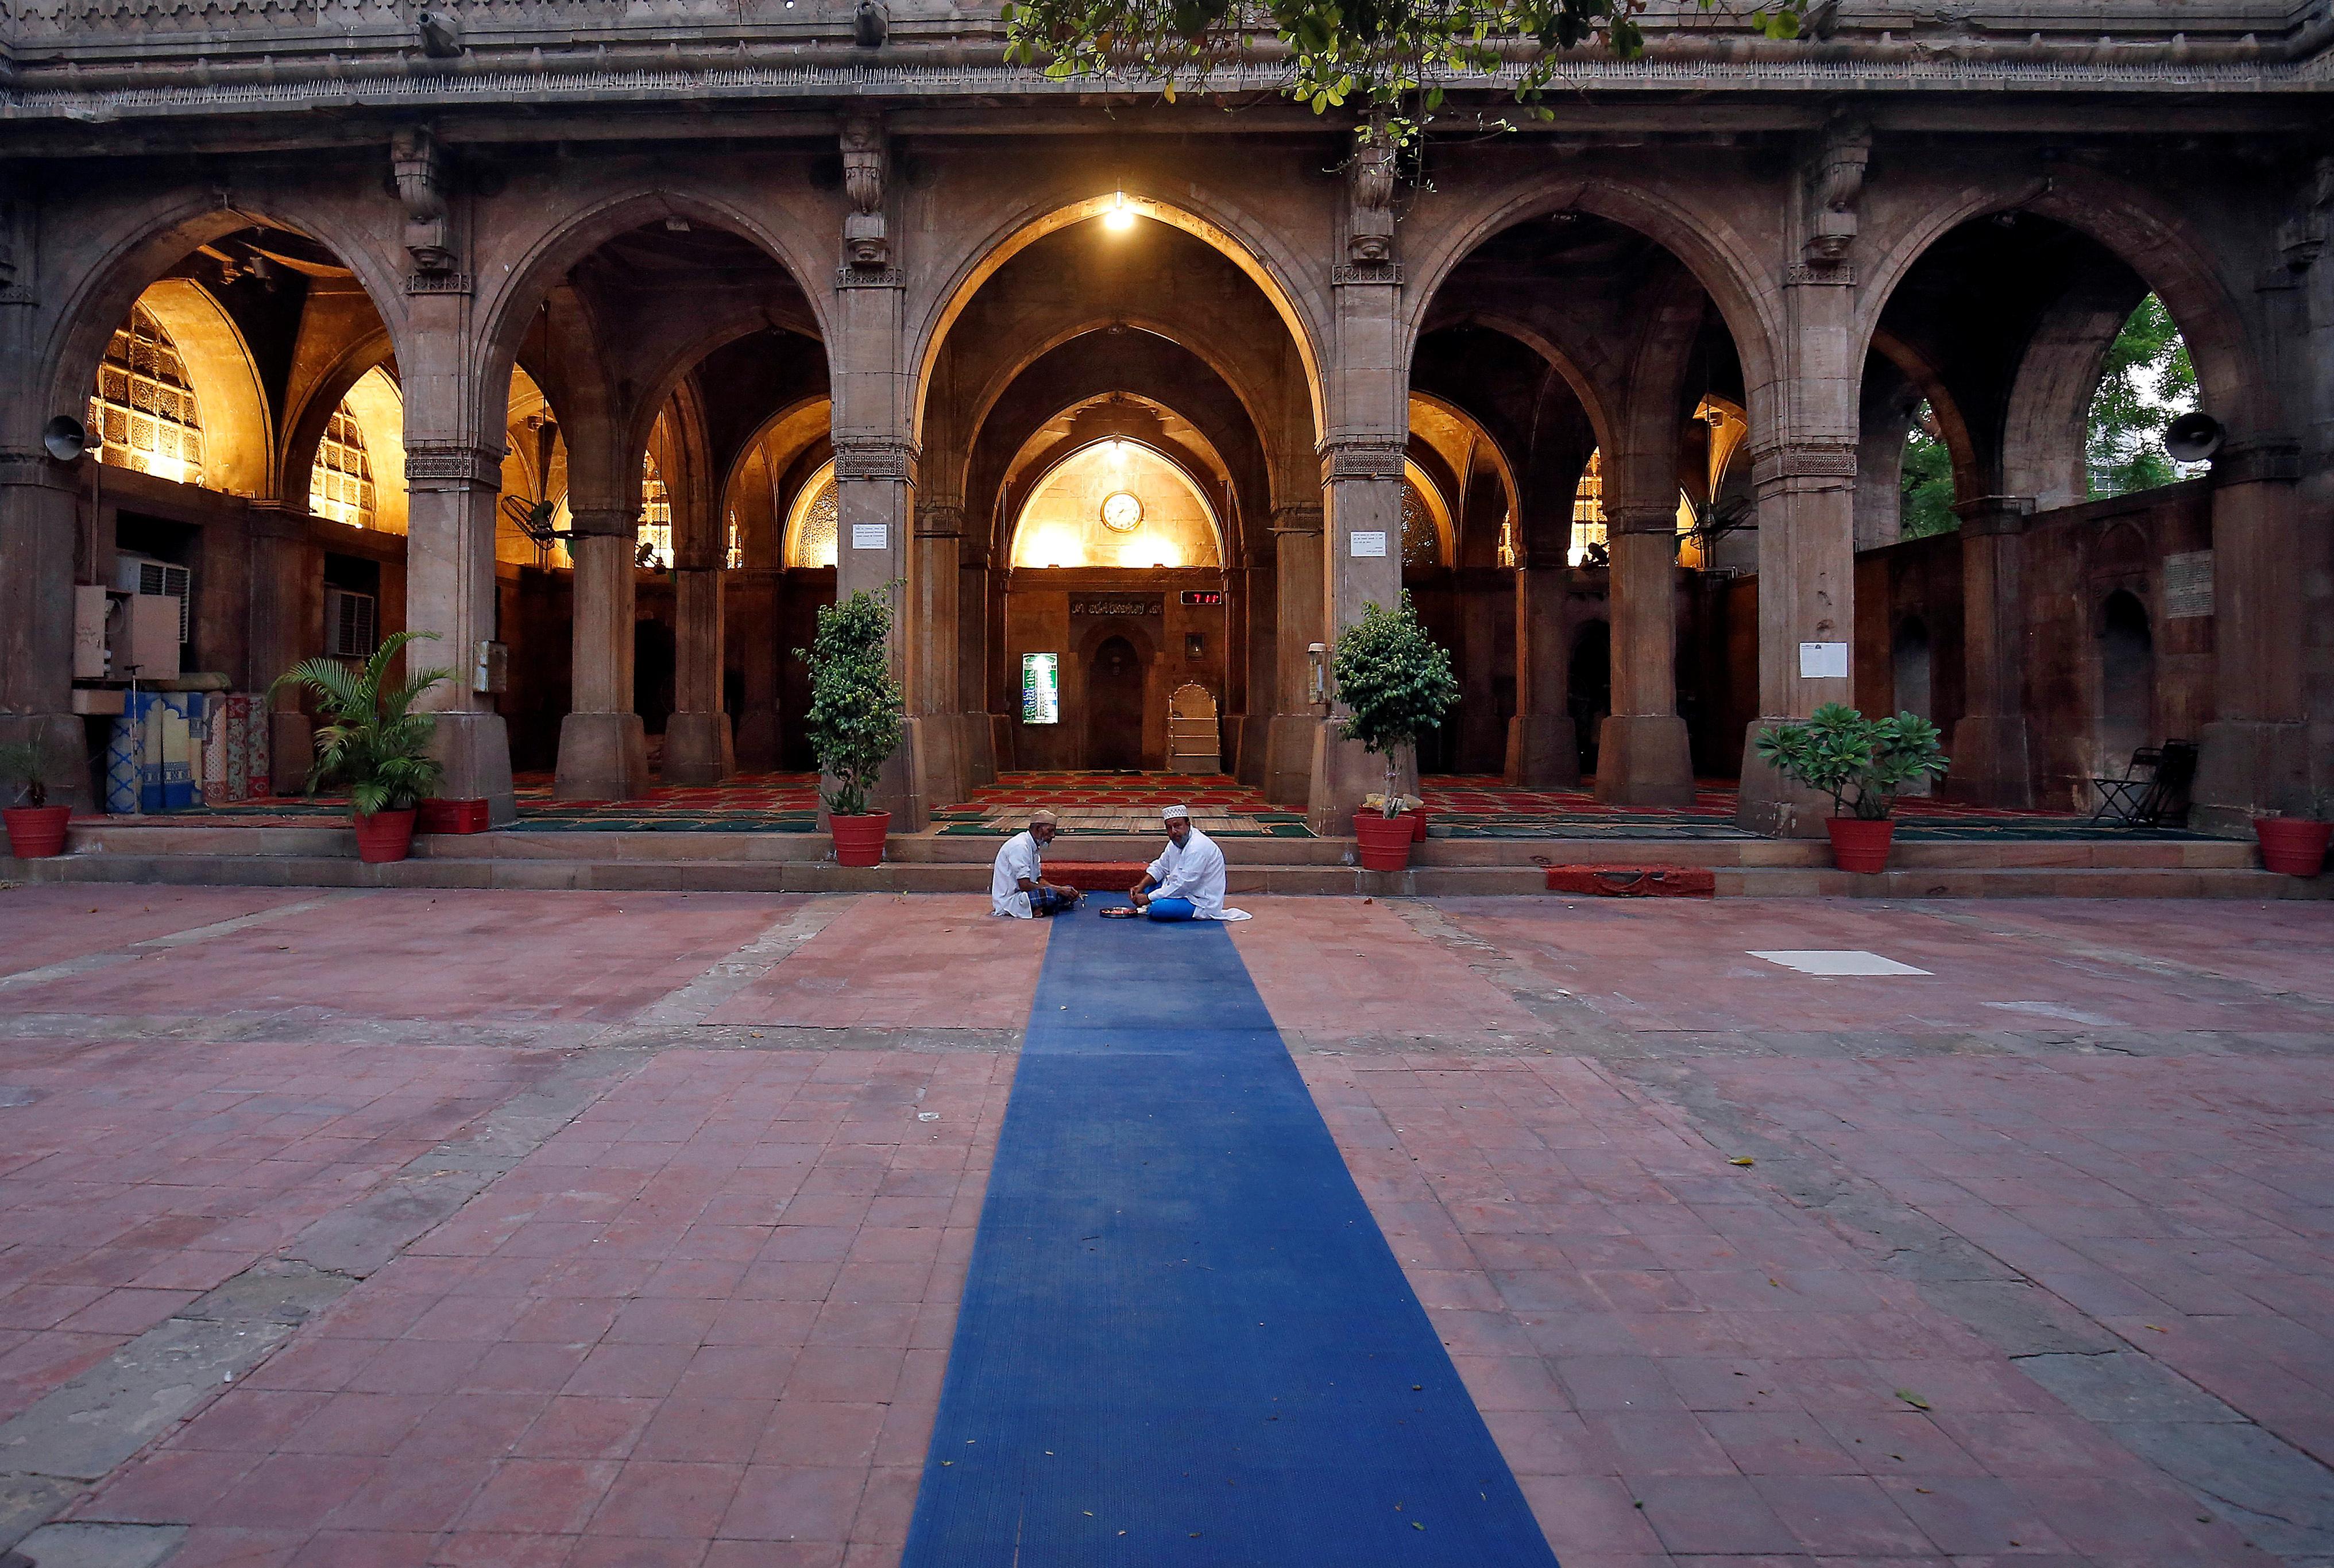 Dos monjes dentro de un templo en Ahmedabad, India (REUTERS/Amit Dave)